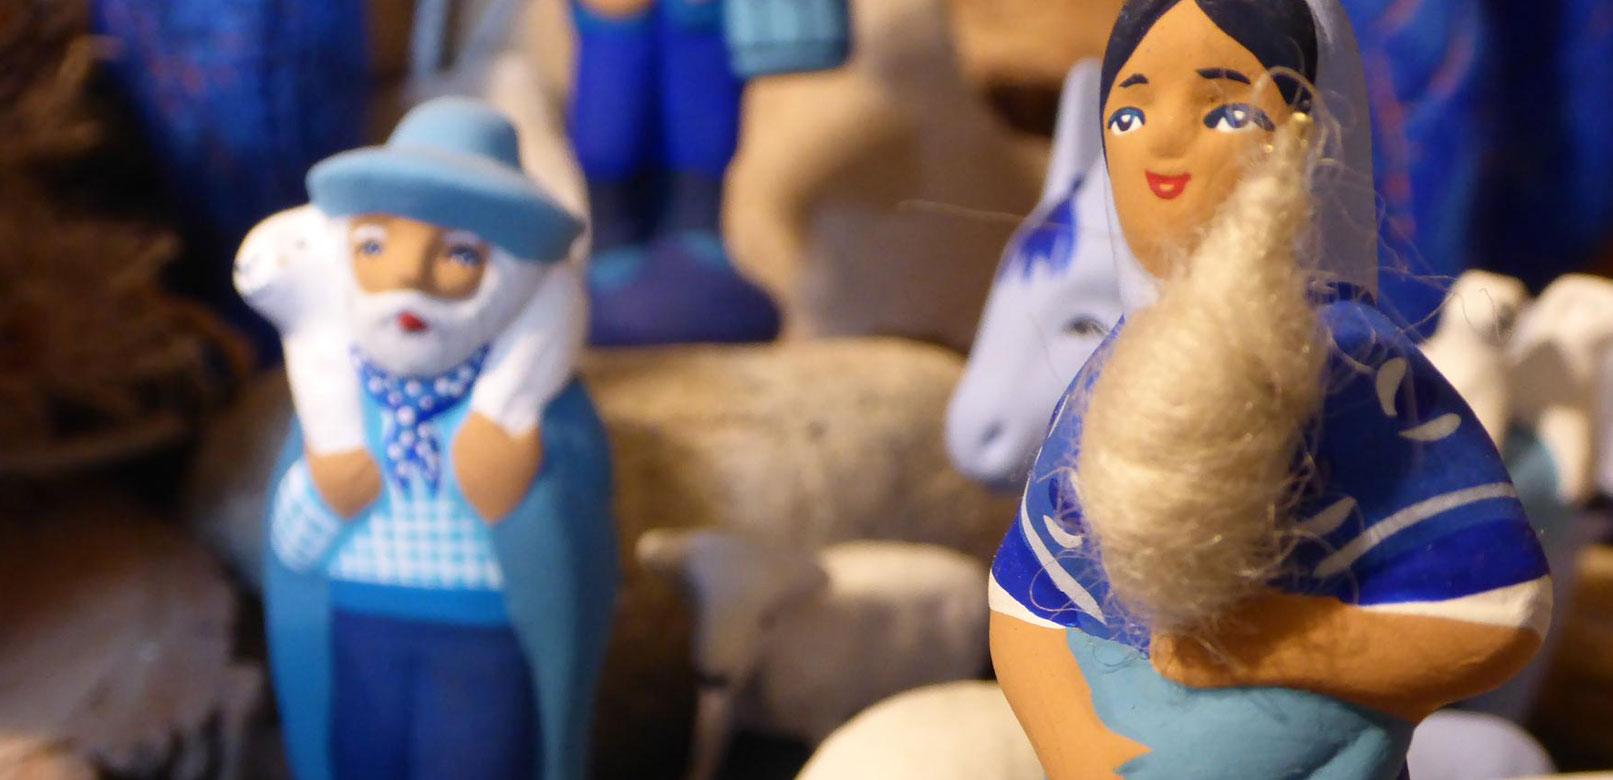 Blauwe santons © Santons bleus